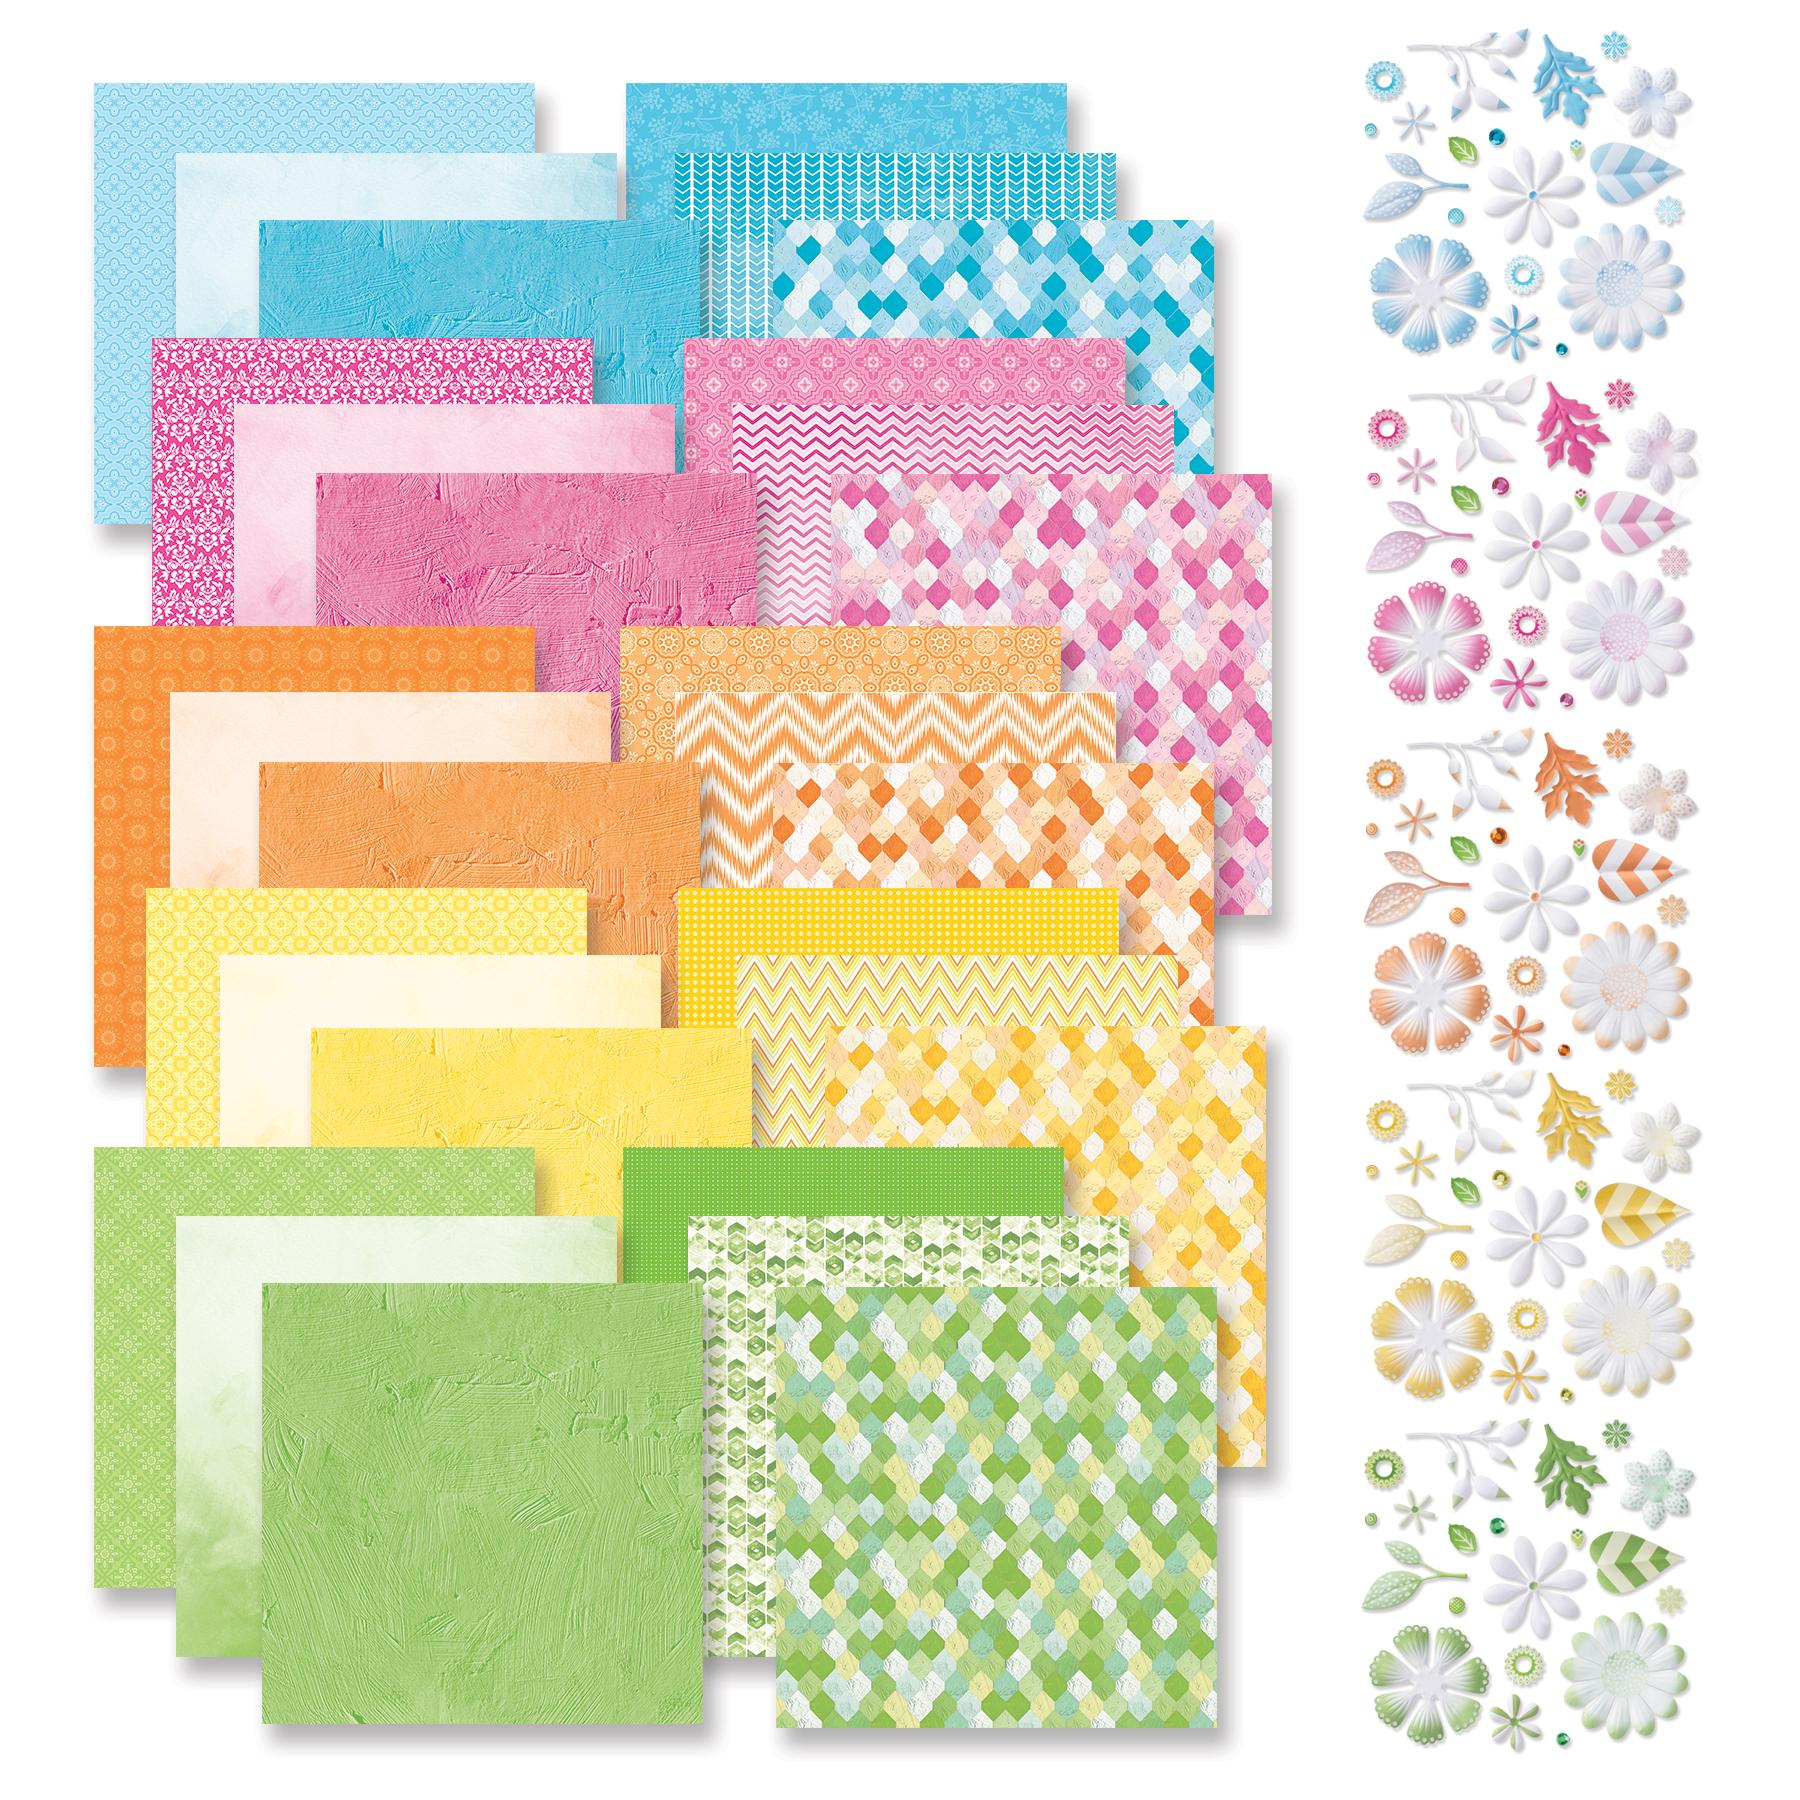 Mix-Match-Collection-Bundle-Feature-Friday-Creative-Memories.jpg